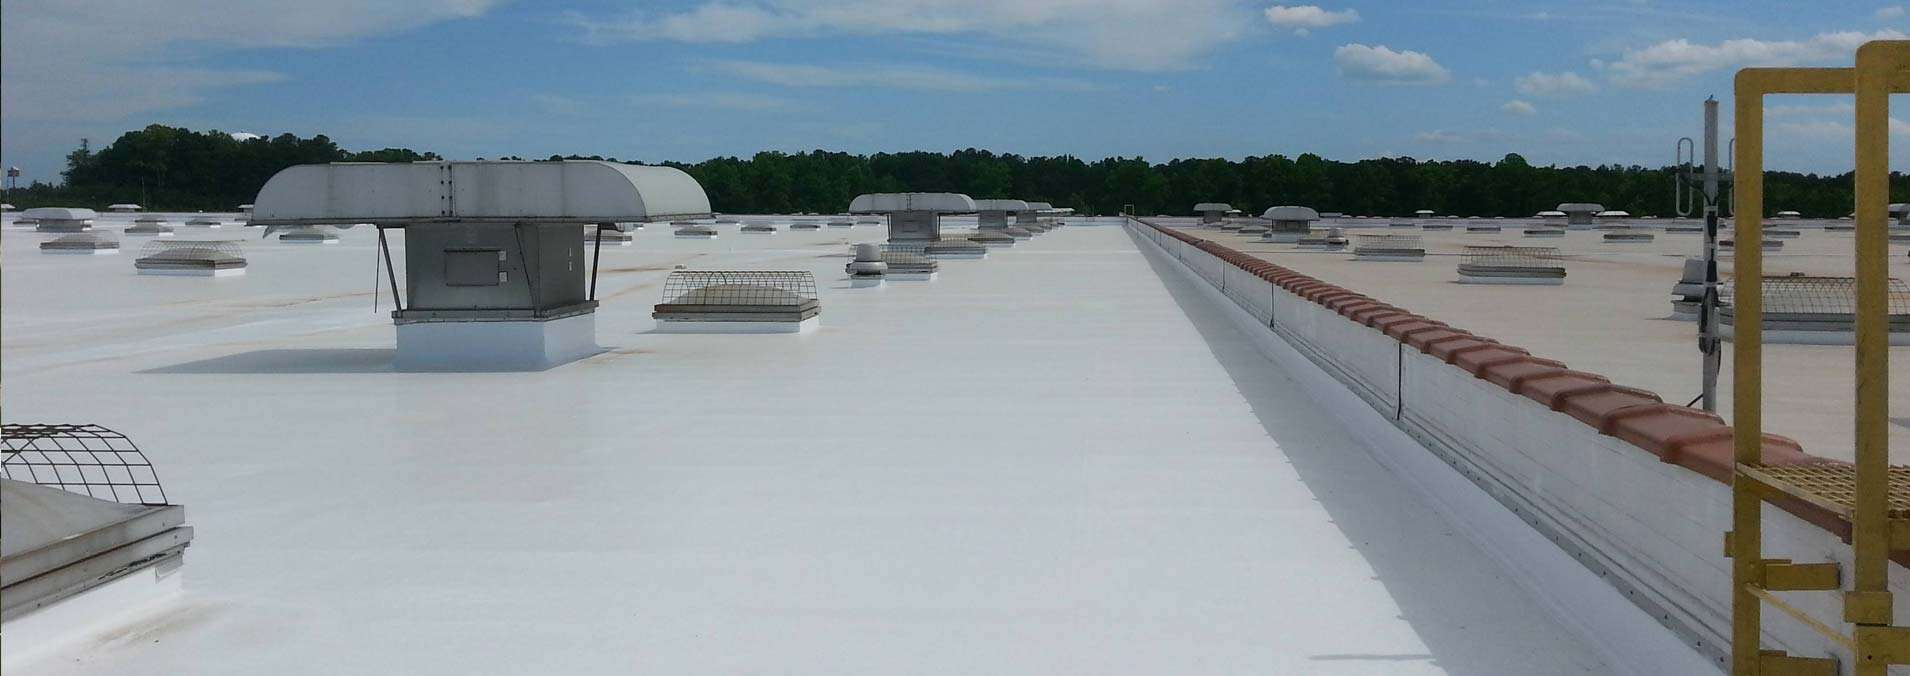 Metal Roof Coatings Atlanta Commercial Metal Roof Repair